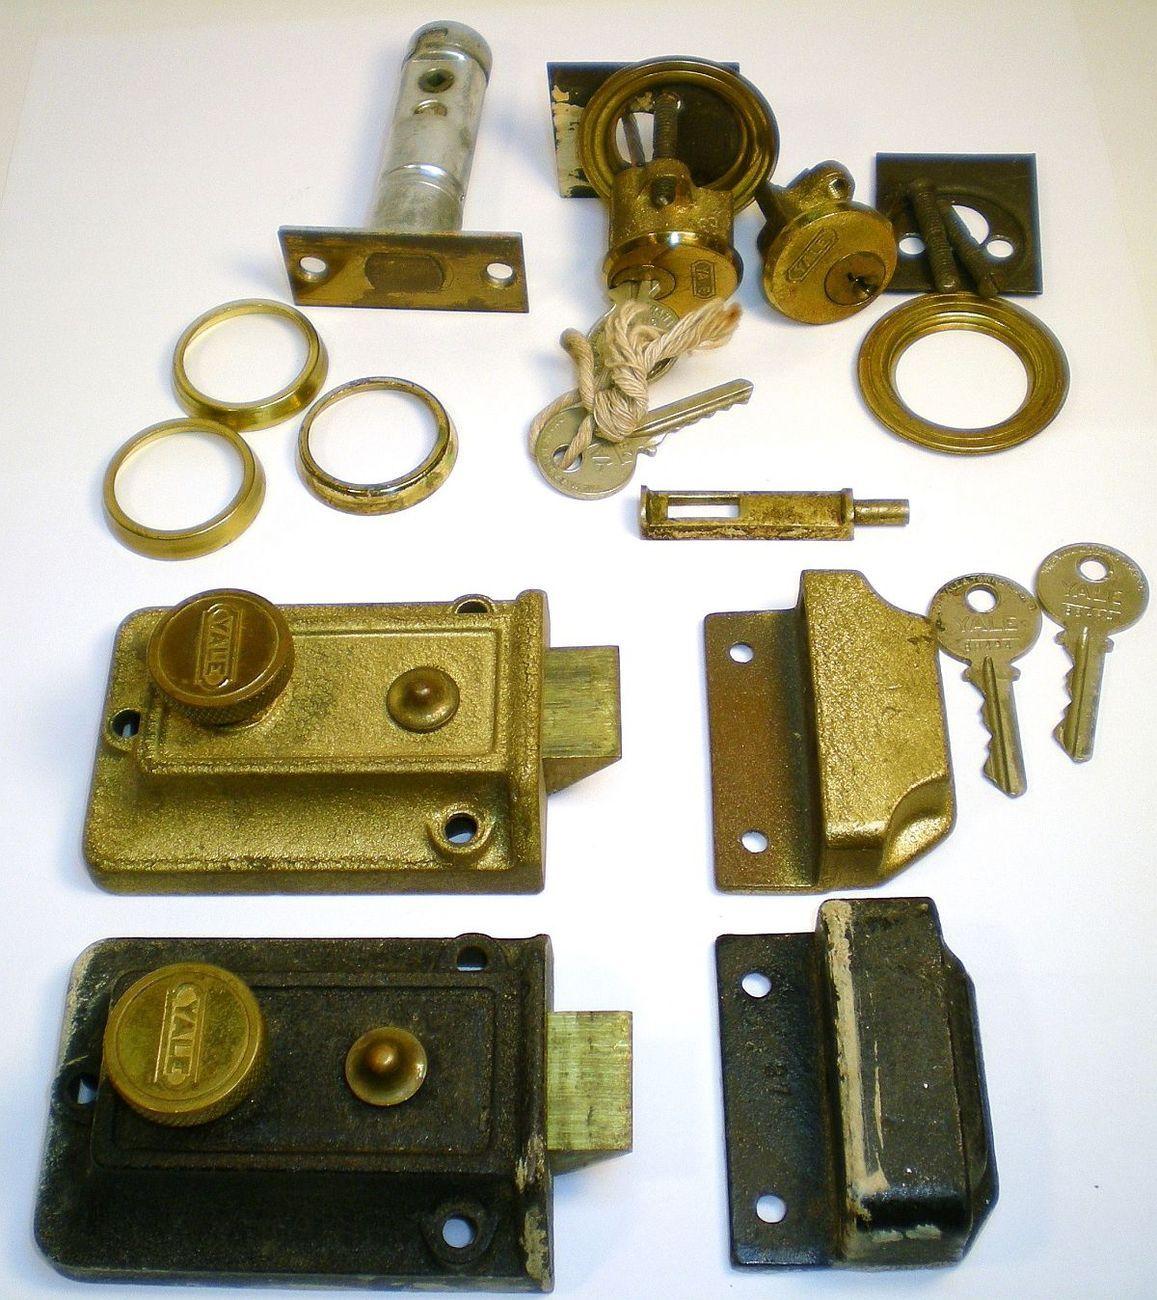 Vintage Yale Deadbolt Locks 042 Cylindar Locks Door